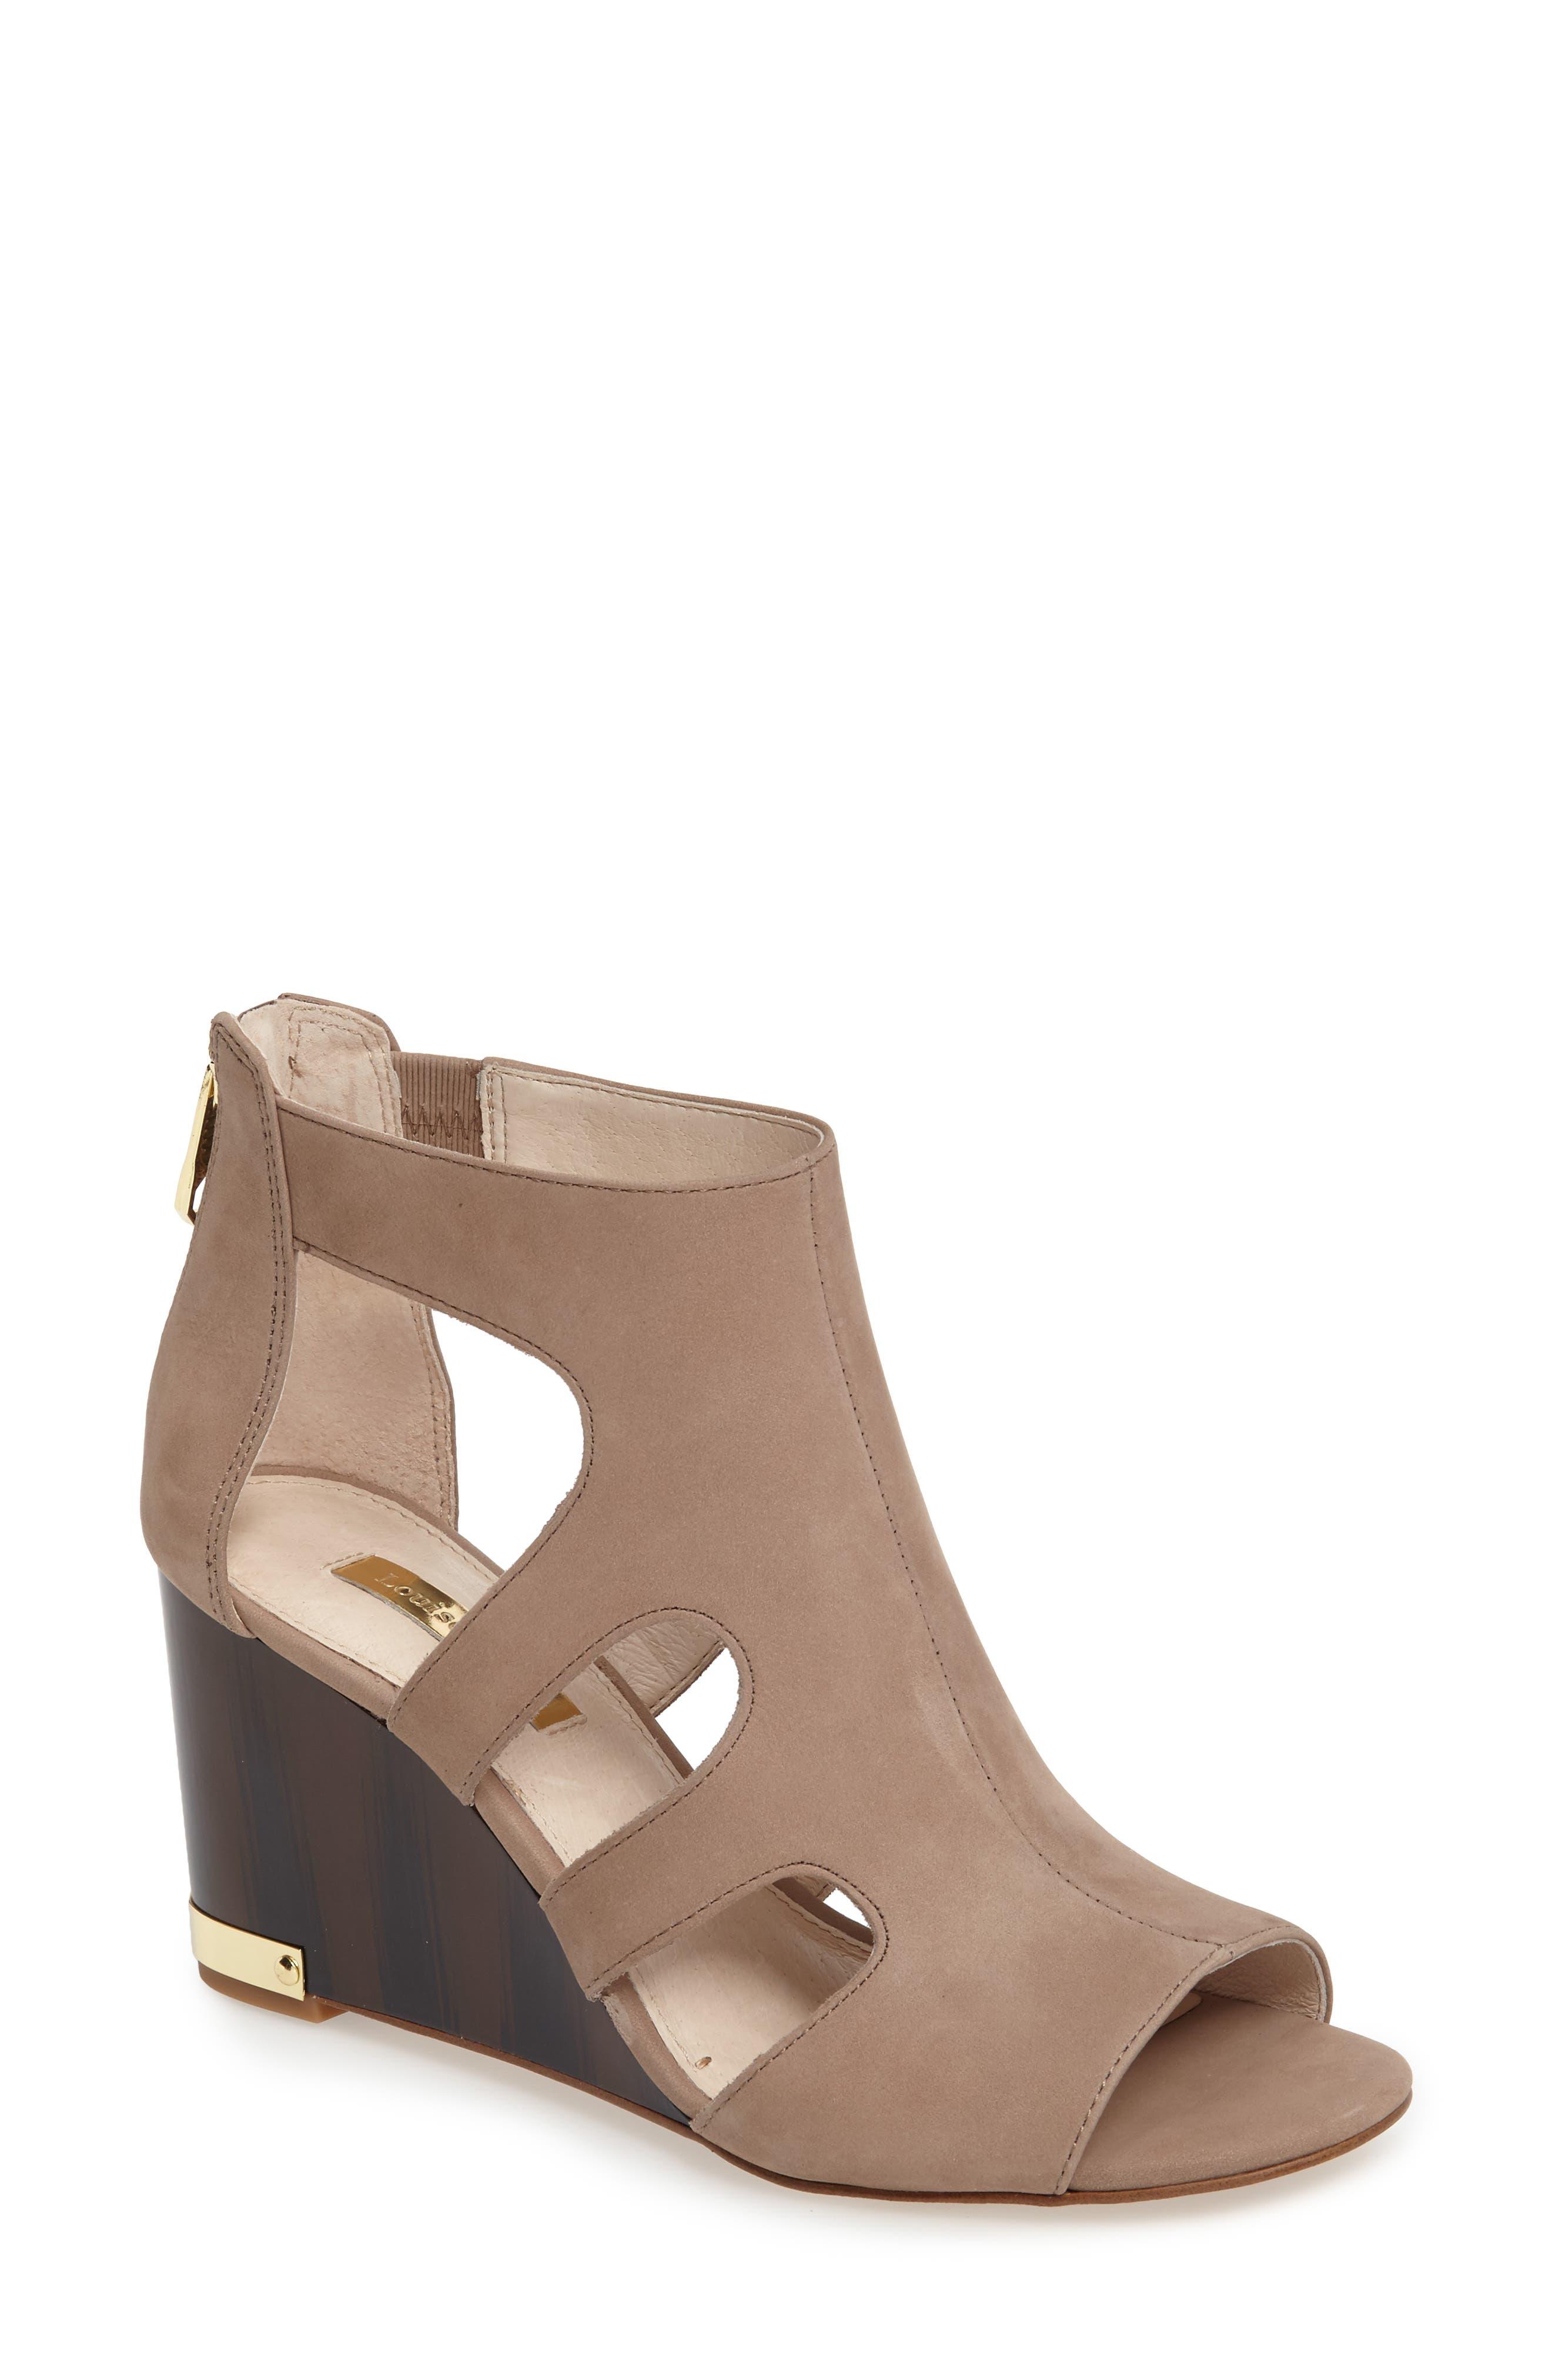 Mirin Wedge Sandal,                         Main,                         color, Neutral Nubuck